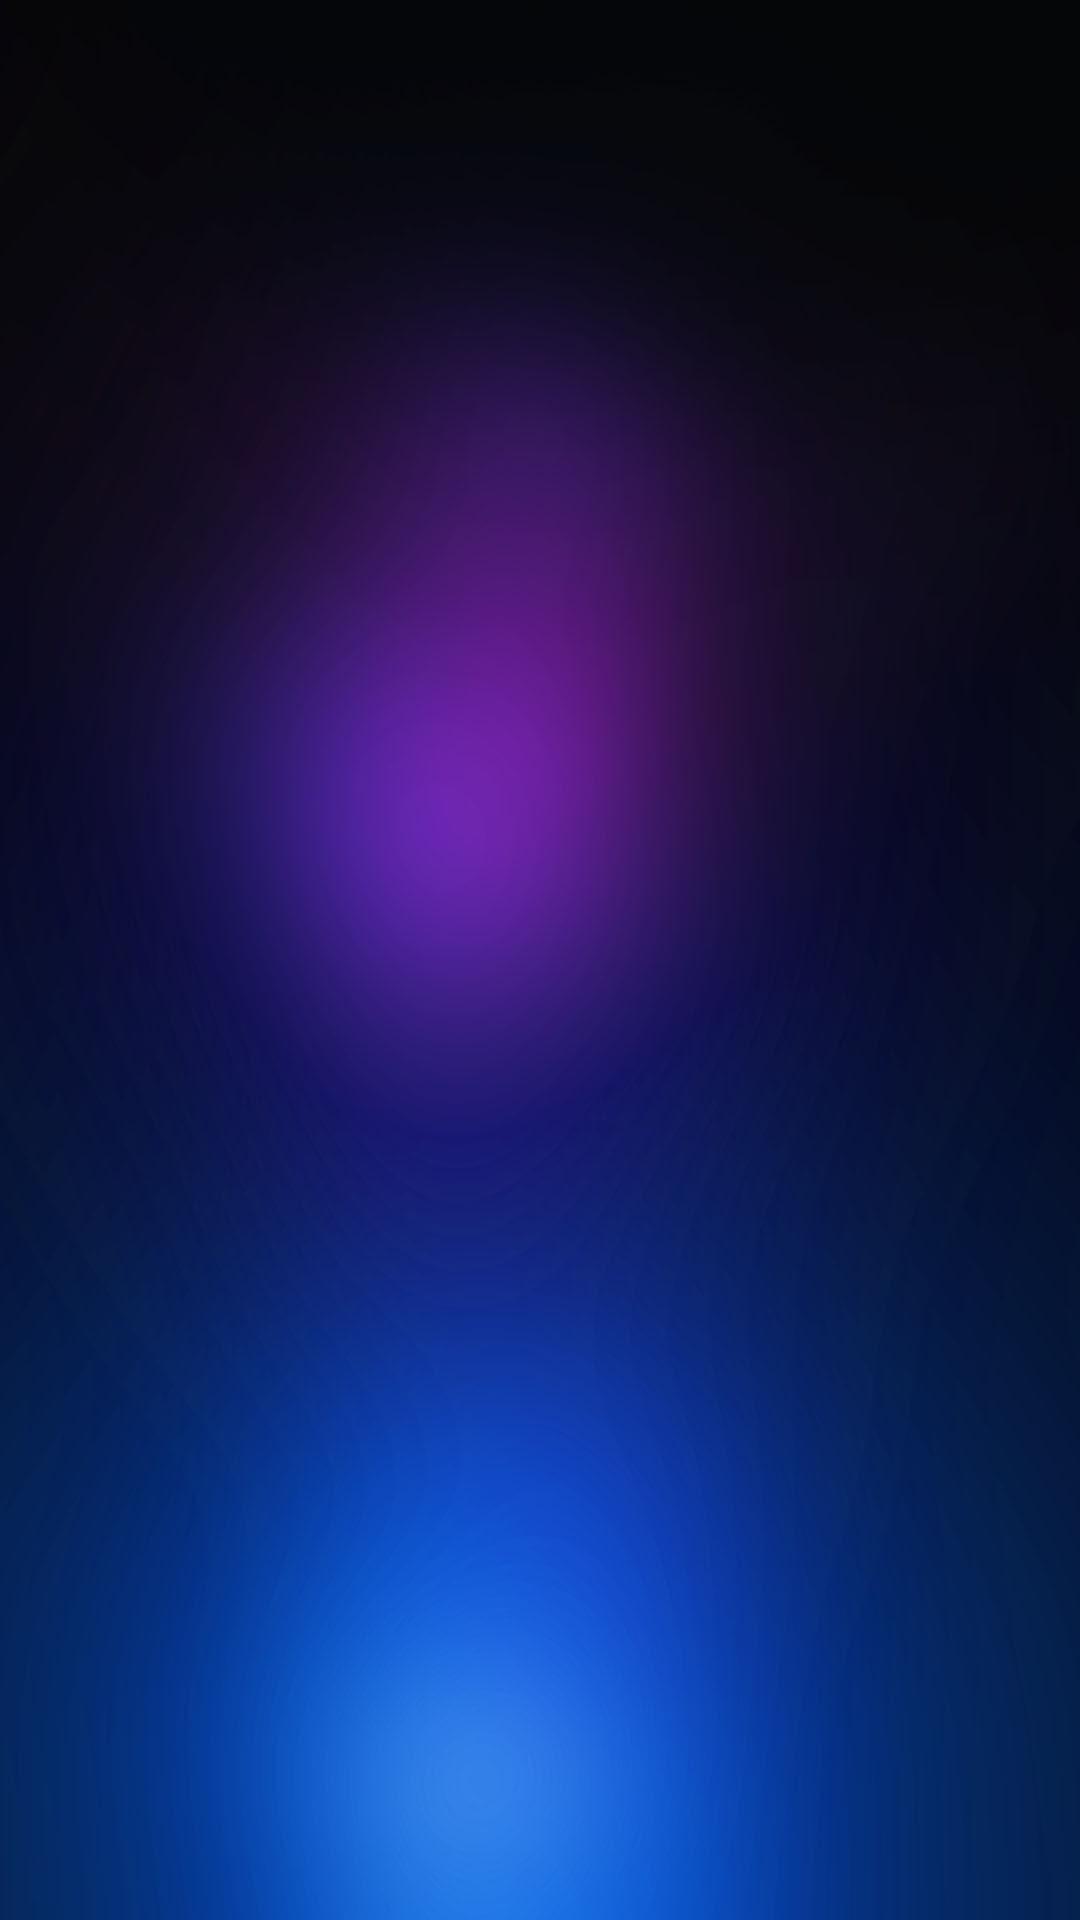 Purple Blue Gradient Samsung Android Wallpaper …